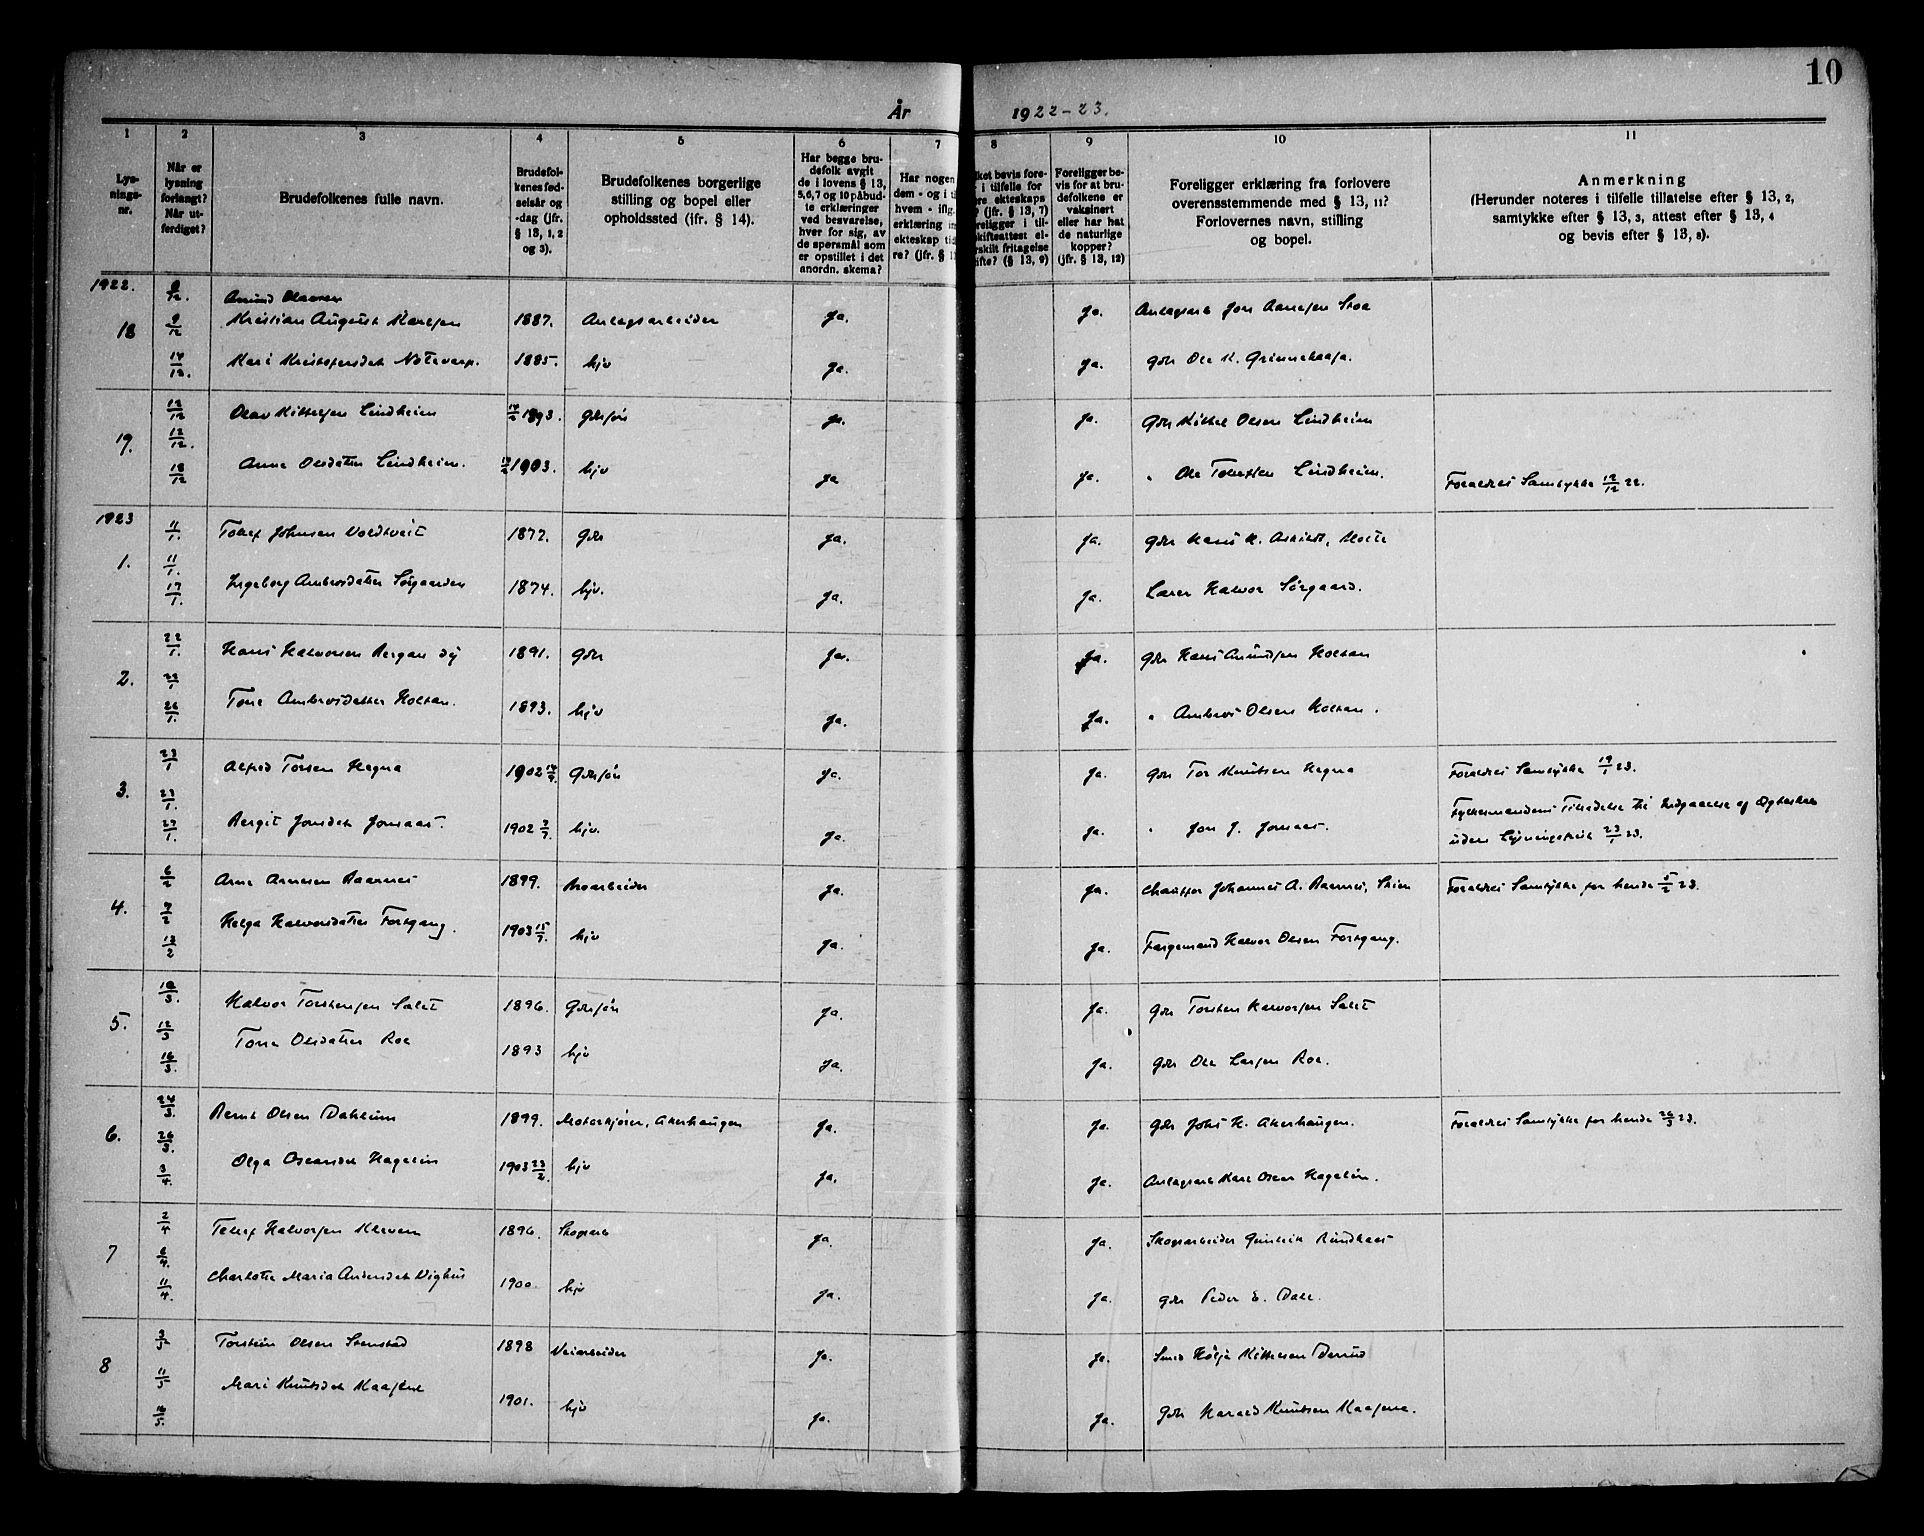 SAKO, Sauherad kirkebøker, H/Ha/L0001: Lysningsprotokoll nr. 1, 1919-1960, s. 10